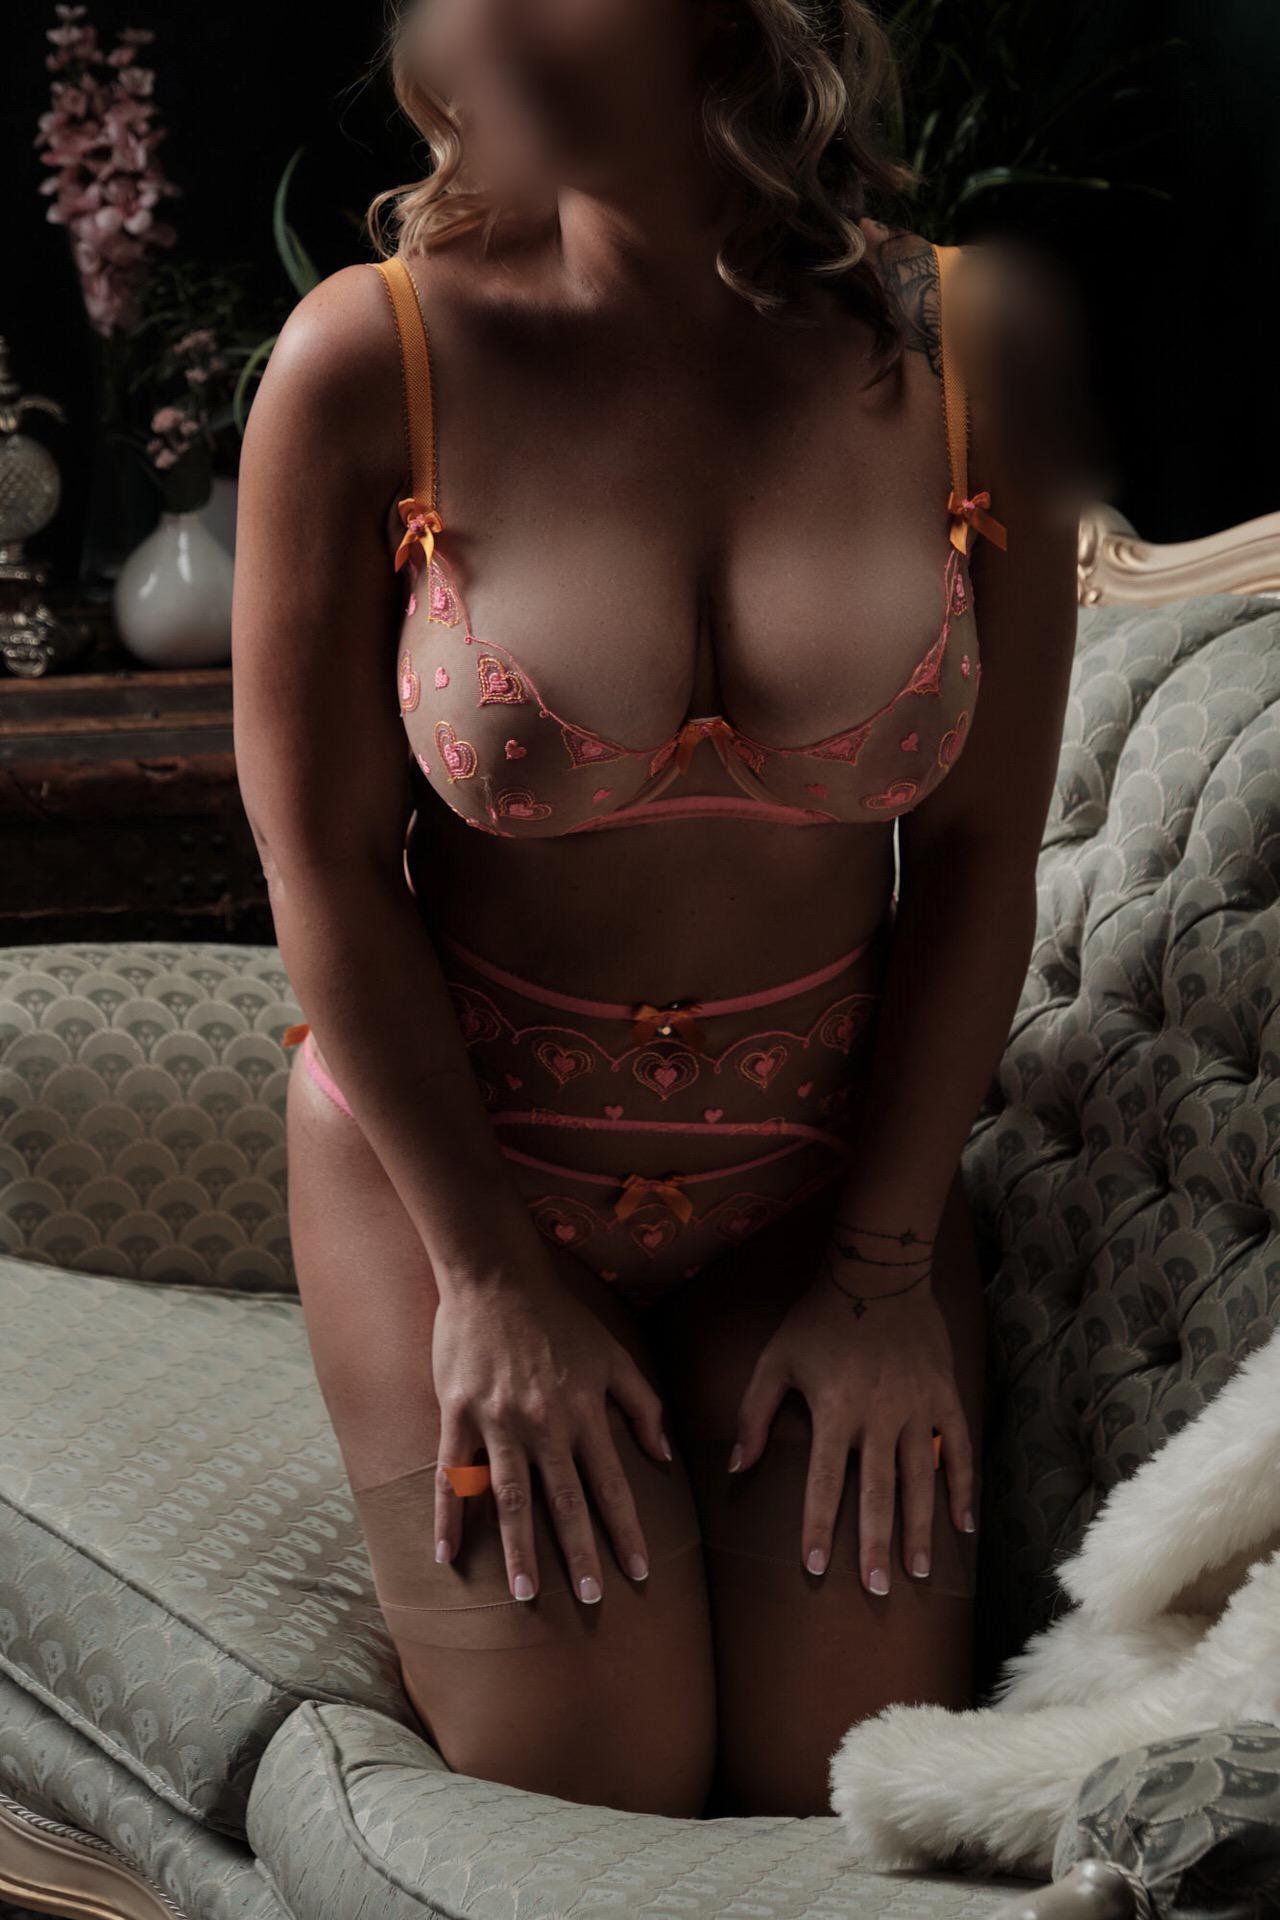 Rachel Sweets Toronto escort posing on bed